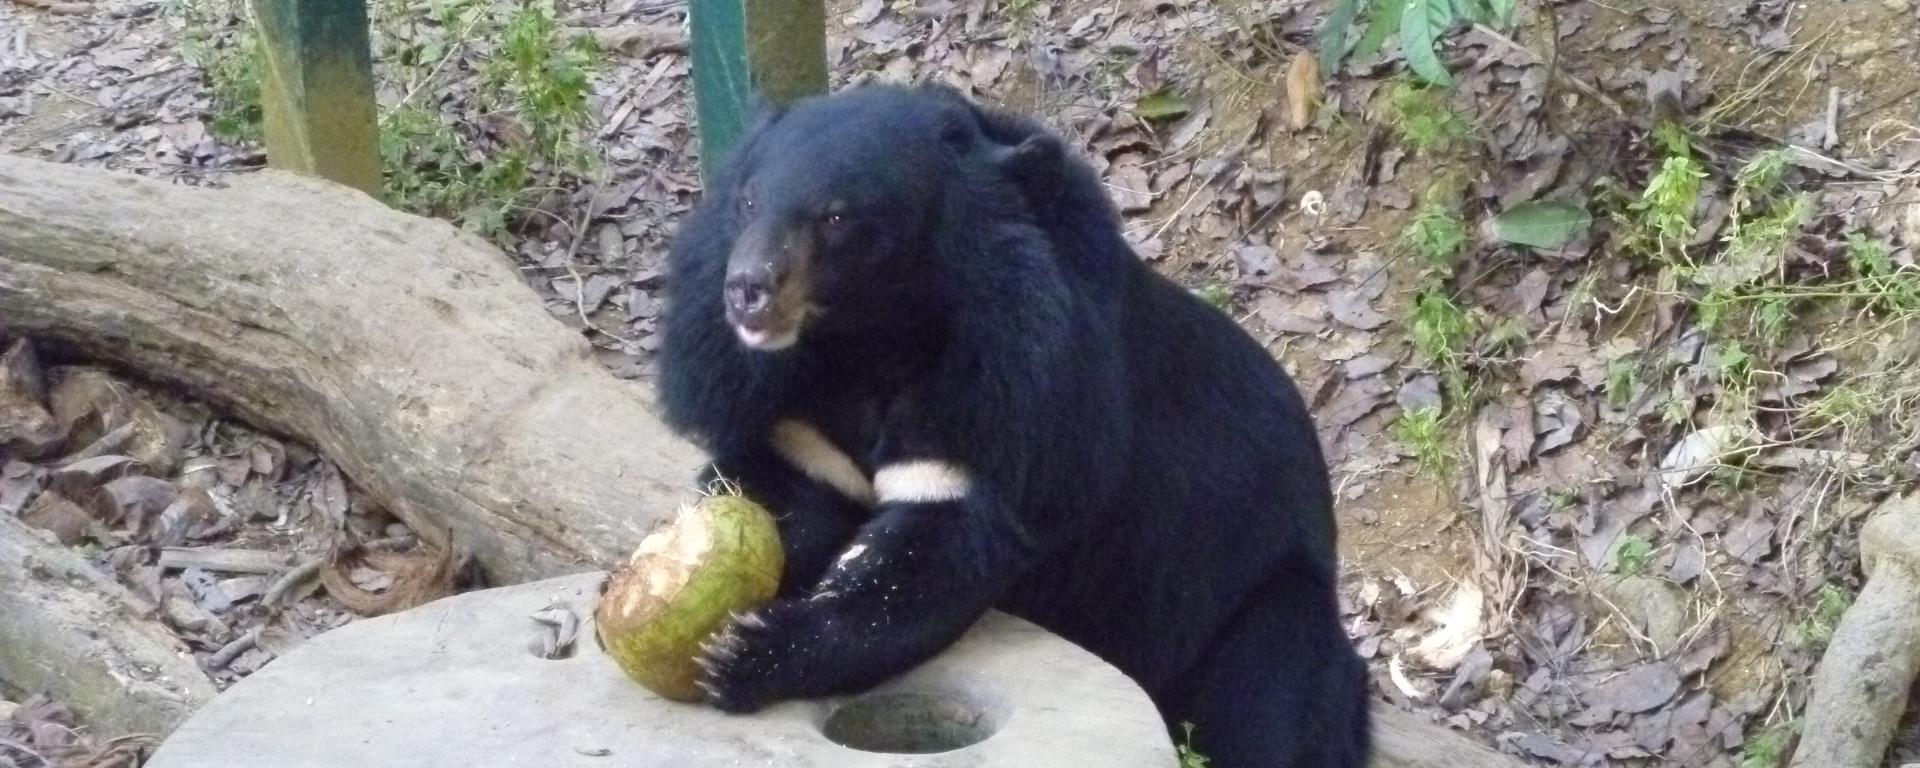 Bear enjoying husking a coconut for enrichment